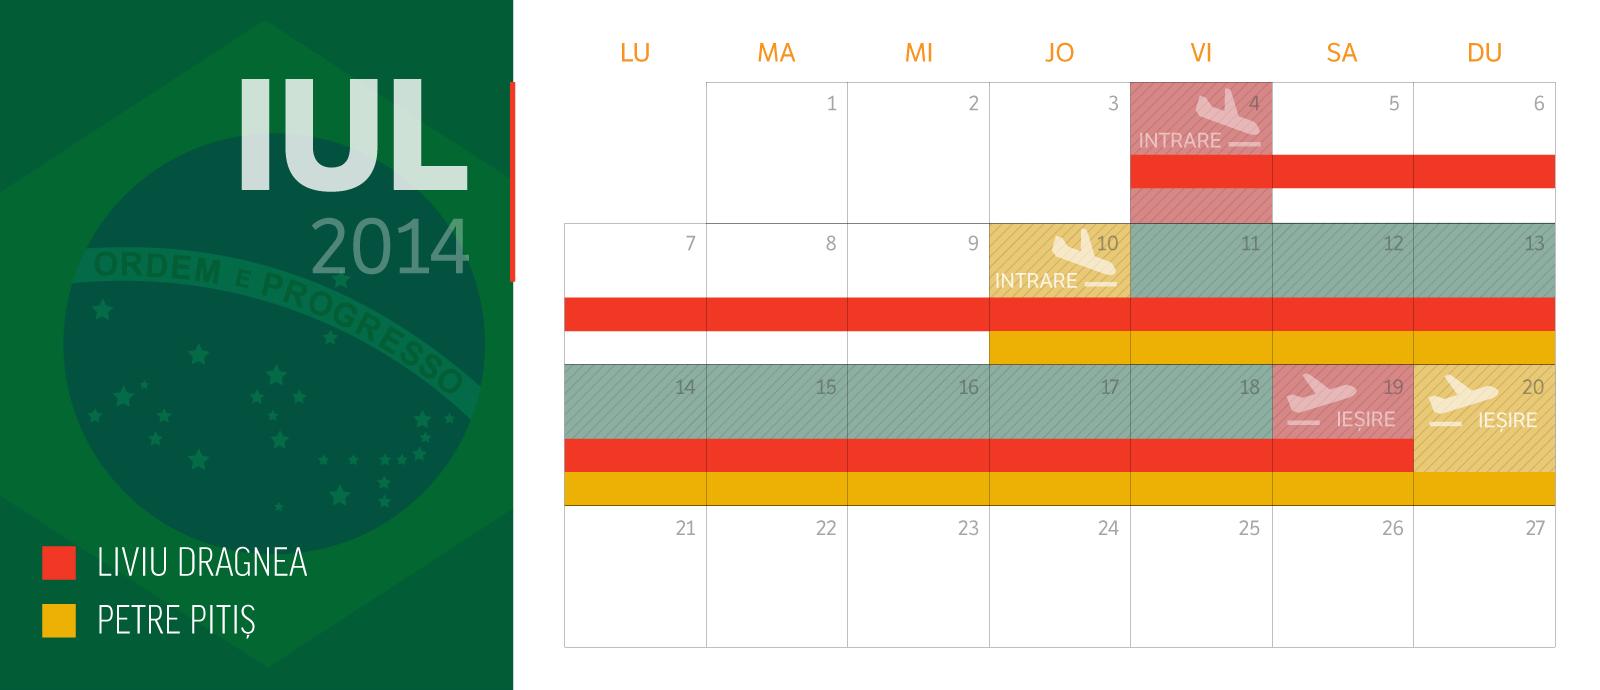 calendar_calatorii_brazilia_dragnea_teldrum_10_Iul_2014